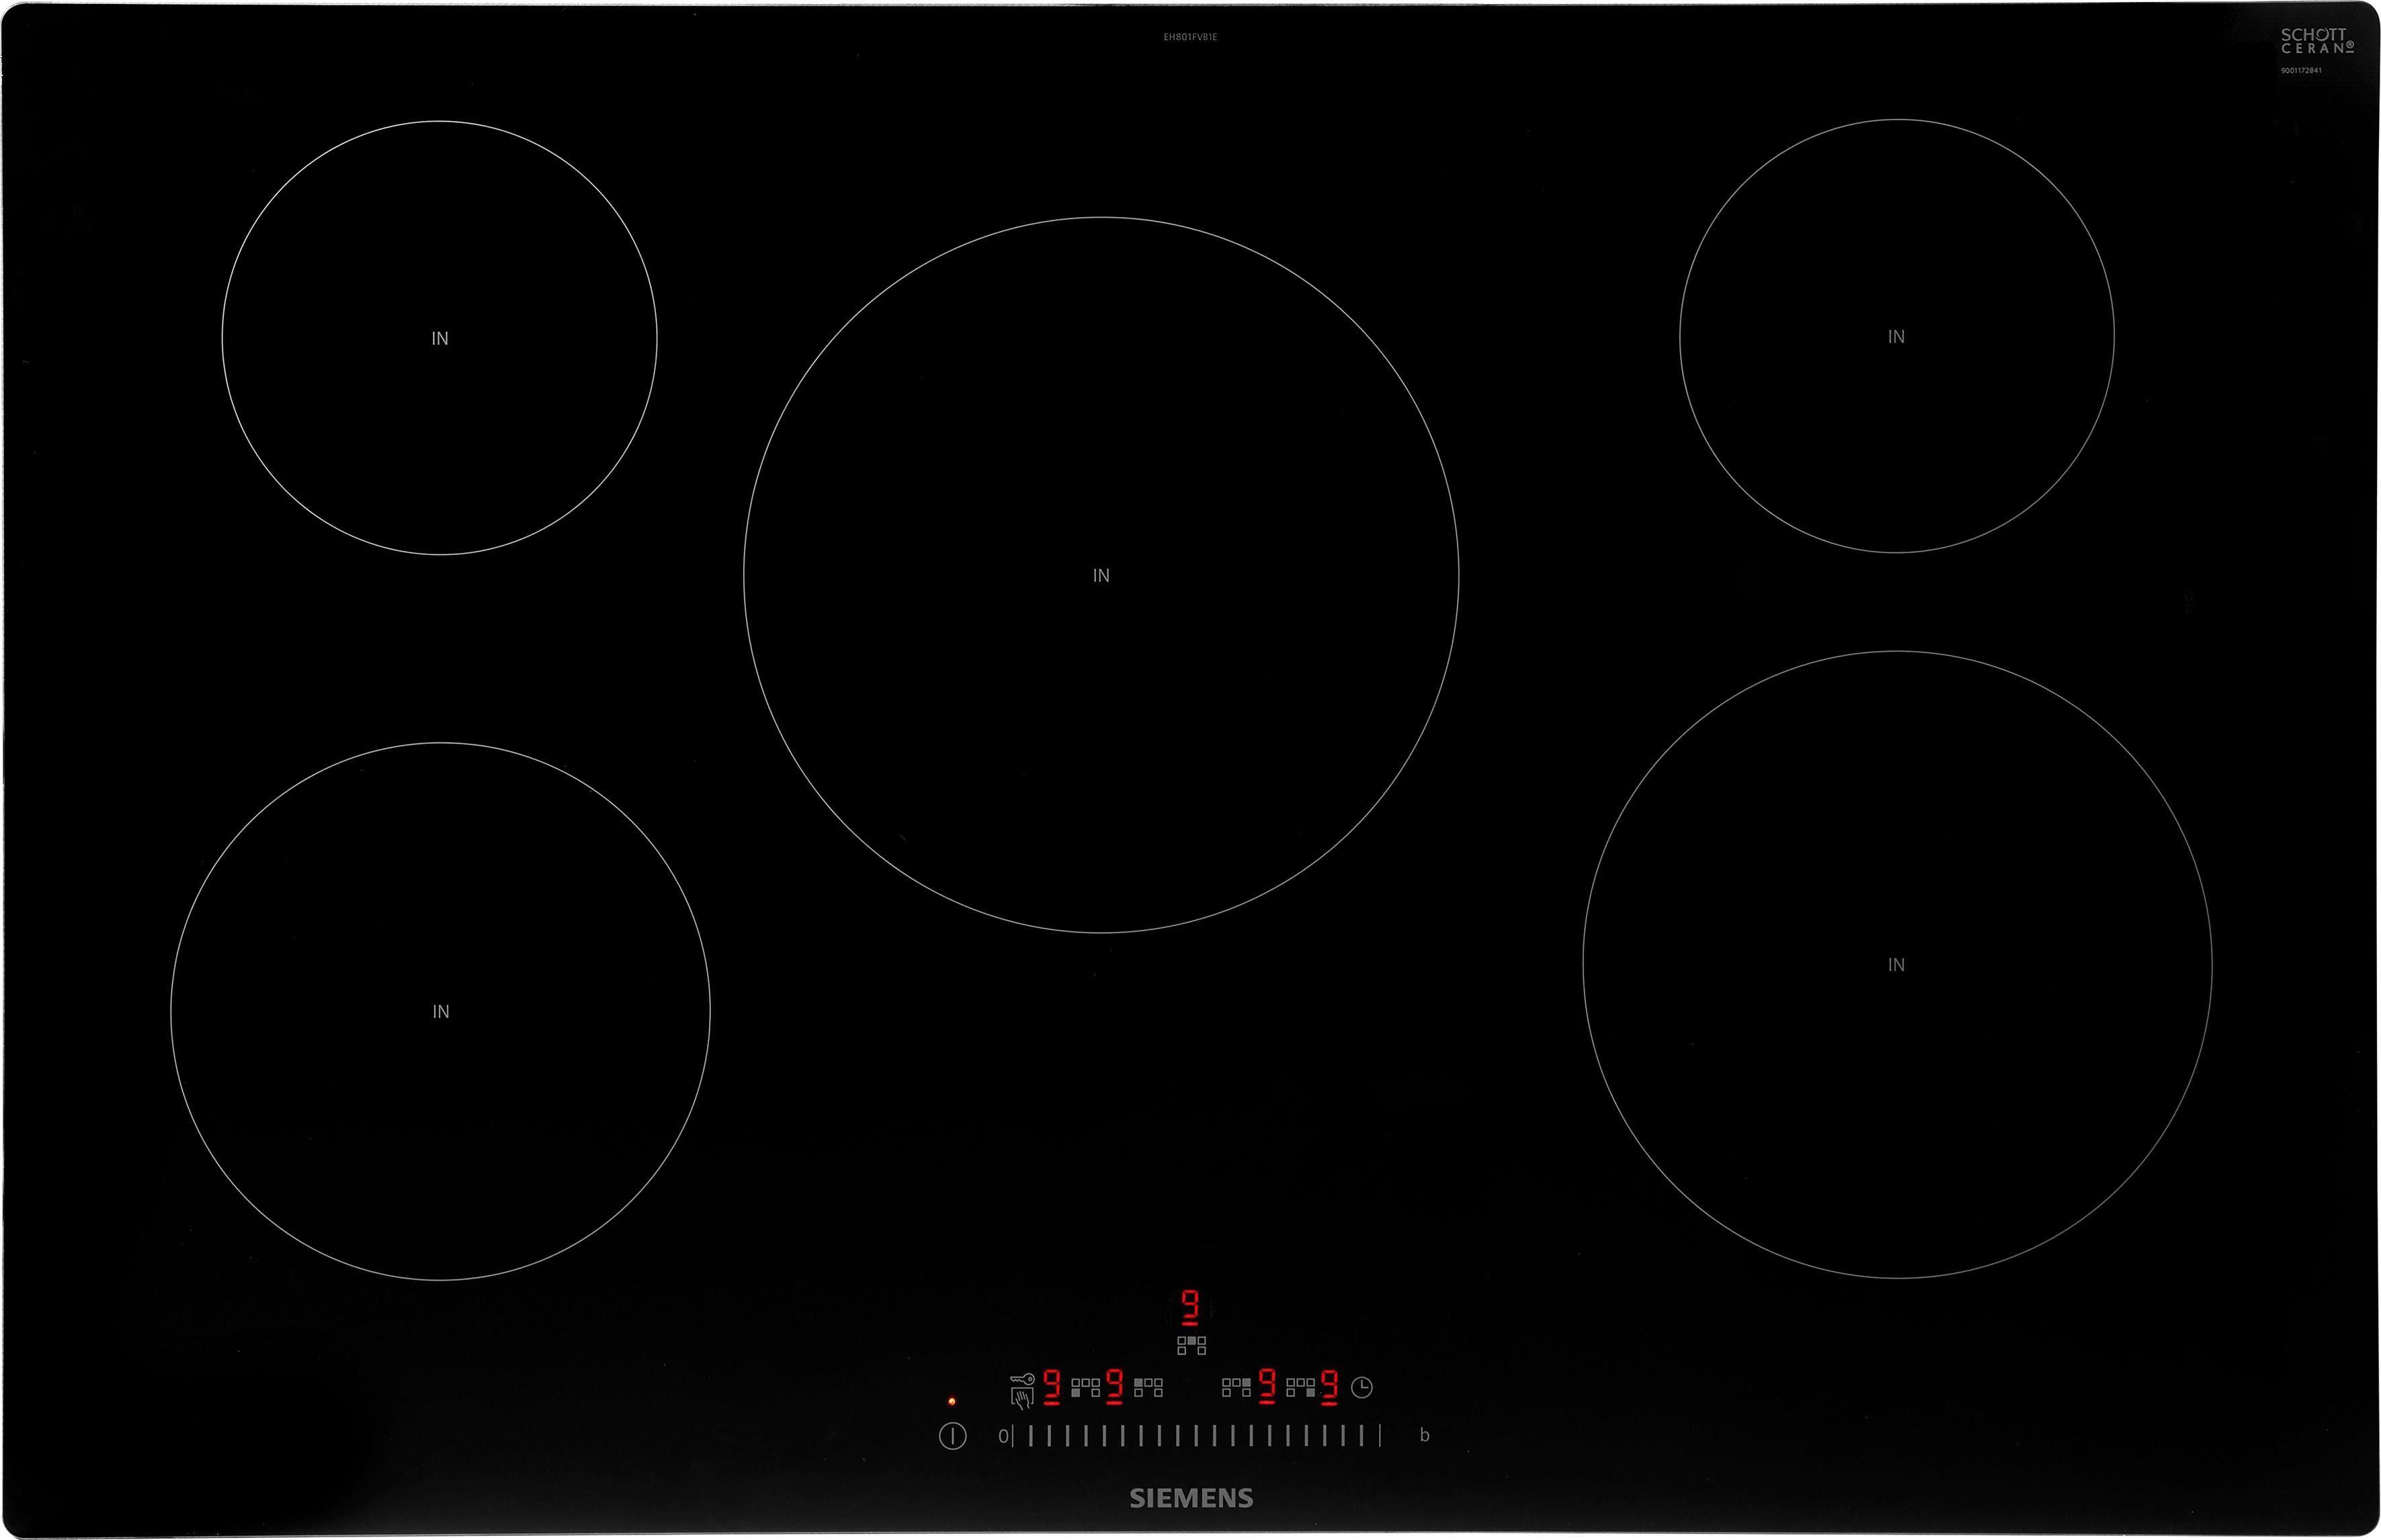 SIEMENS Induktions-Kochfeld von SCHOTT CERAN® EH801FVB1E EH801FVB1E